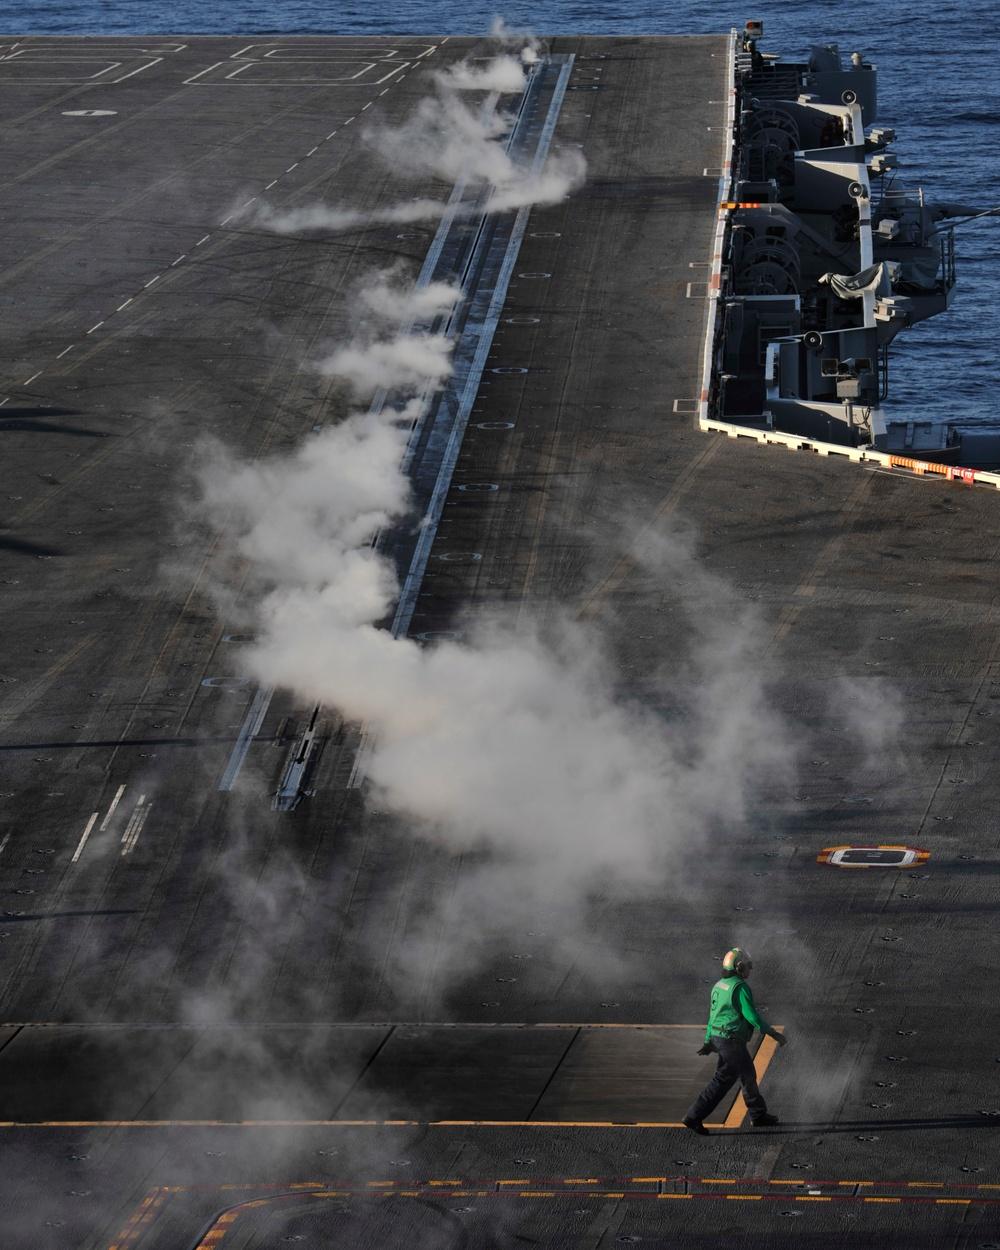 Sailor works on Nimitz flight deck